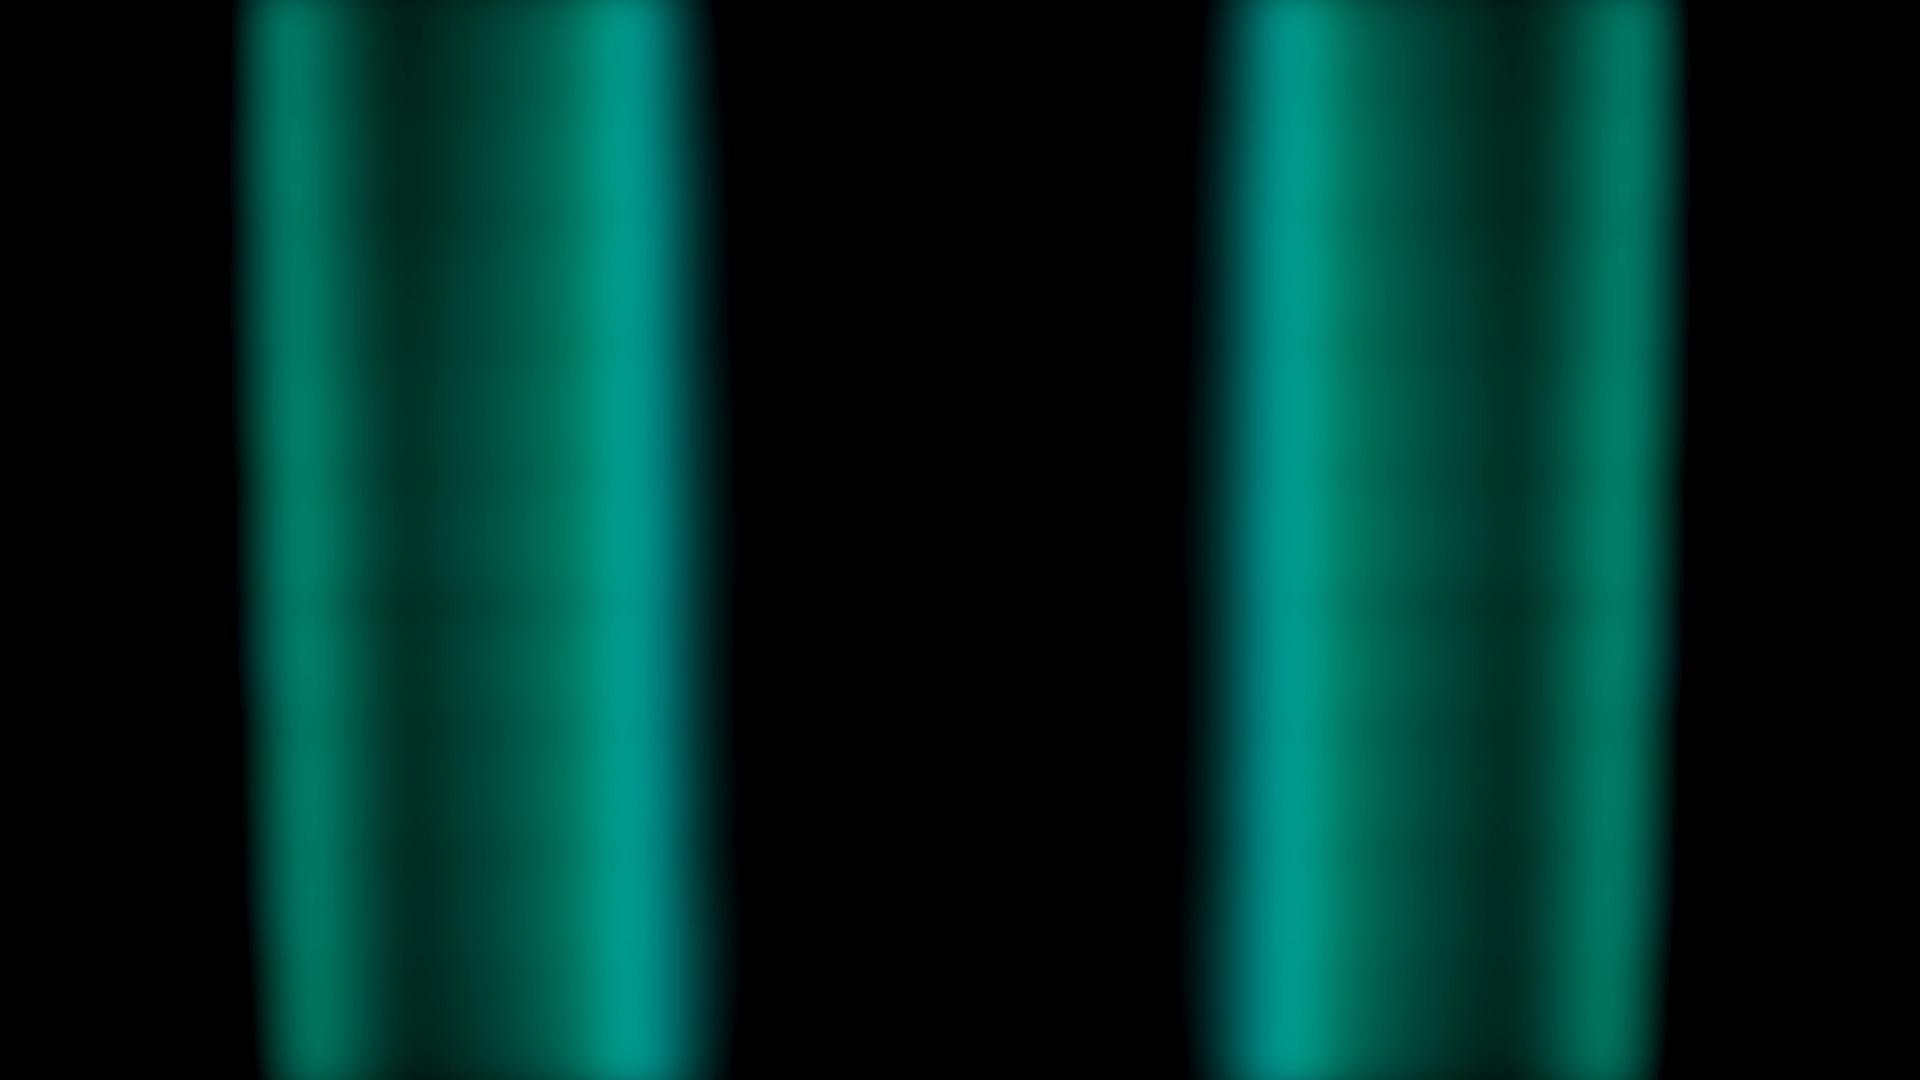 Sorrow - Green Lines Wide 1